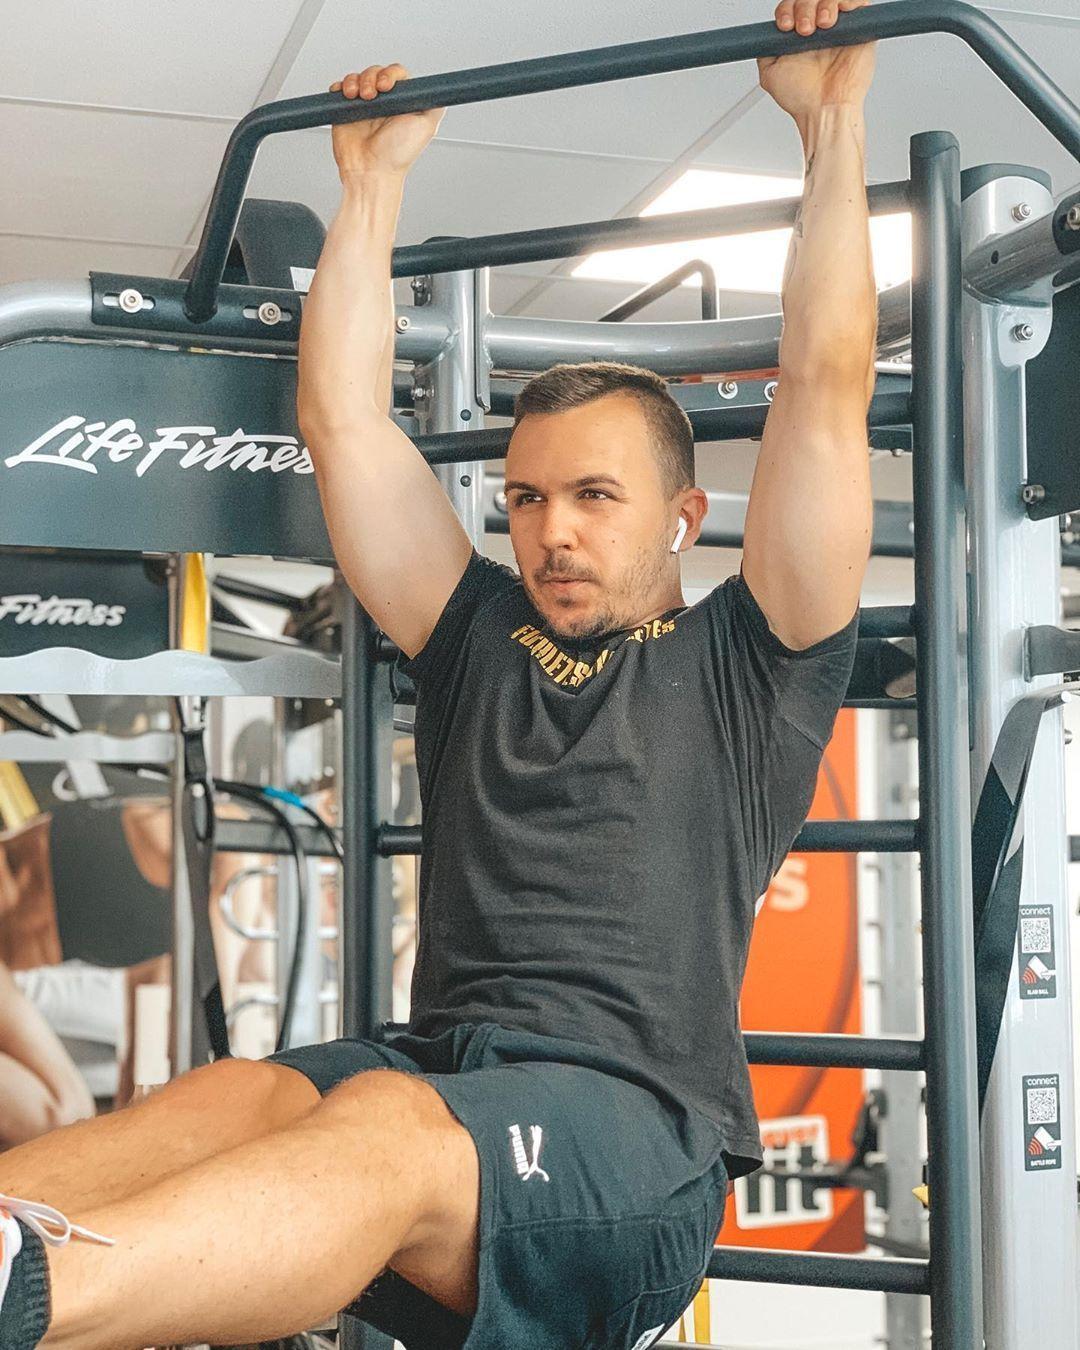 #transformation #fitnessstudio #fitfamgerman #strandkrper #definieren #abnehmen #training #muskeln #...